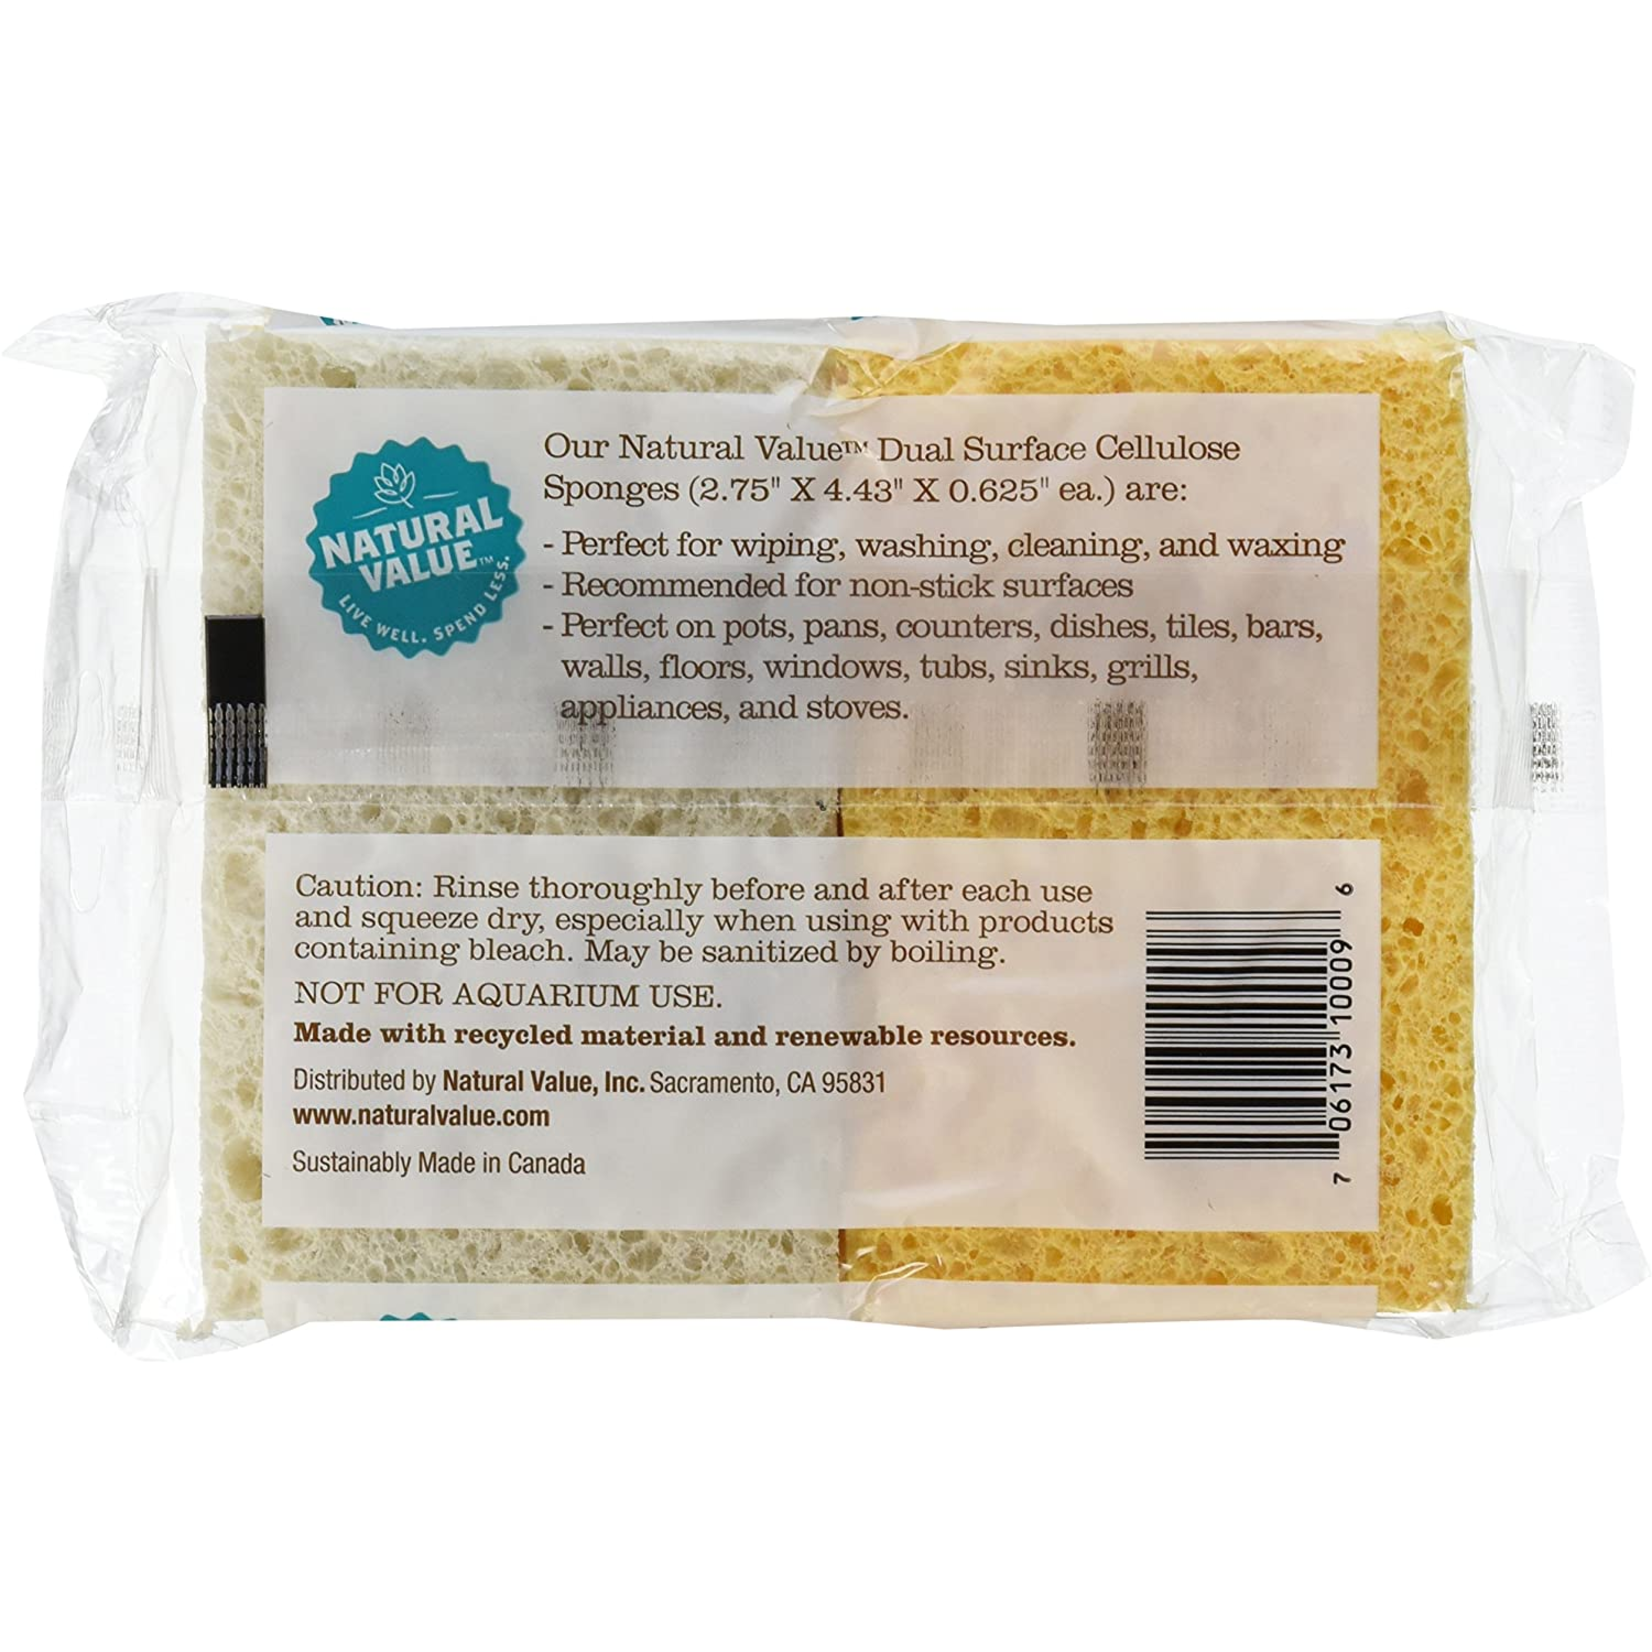 Natural Value Natural Value Dual Surface Cellulose Sponge - 4pk